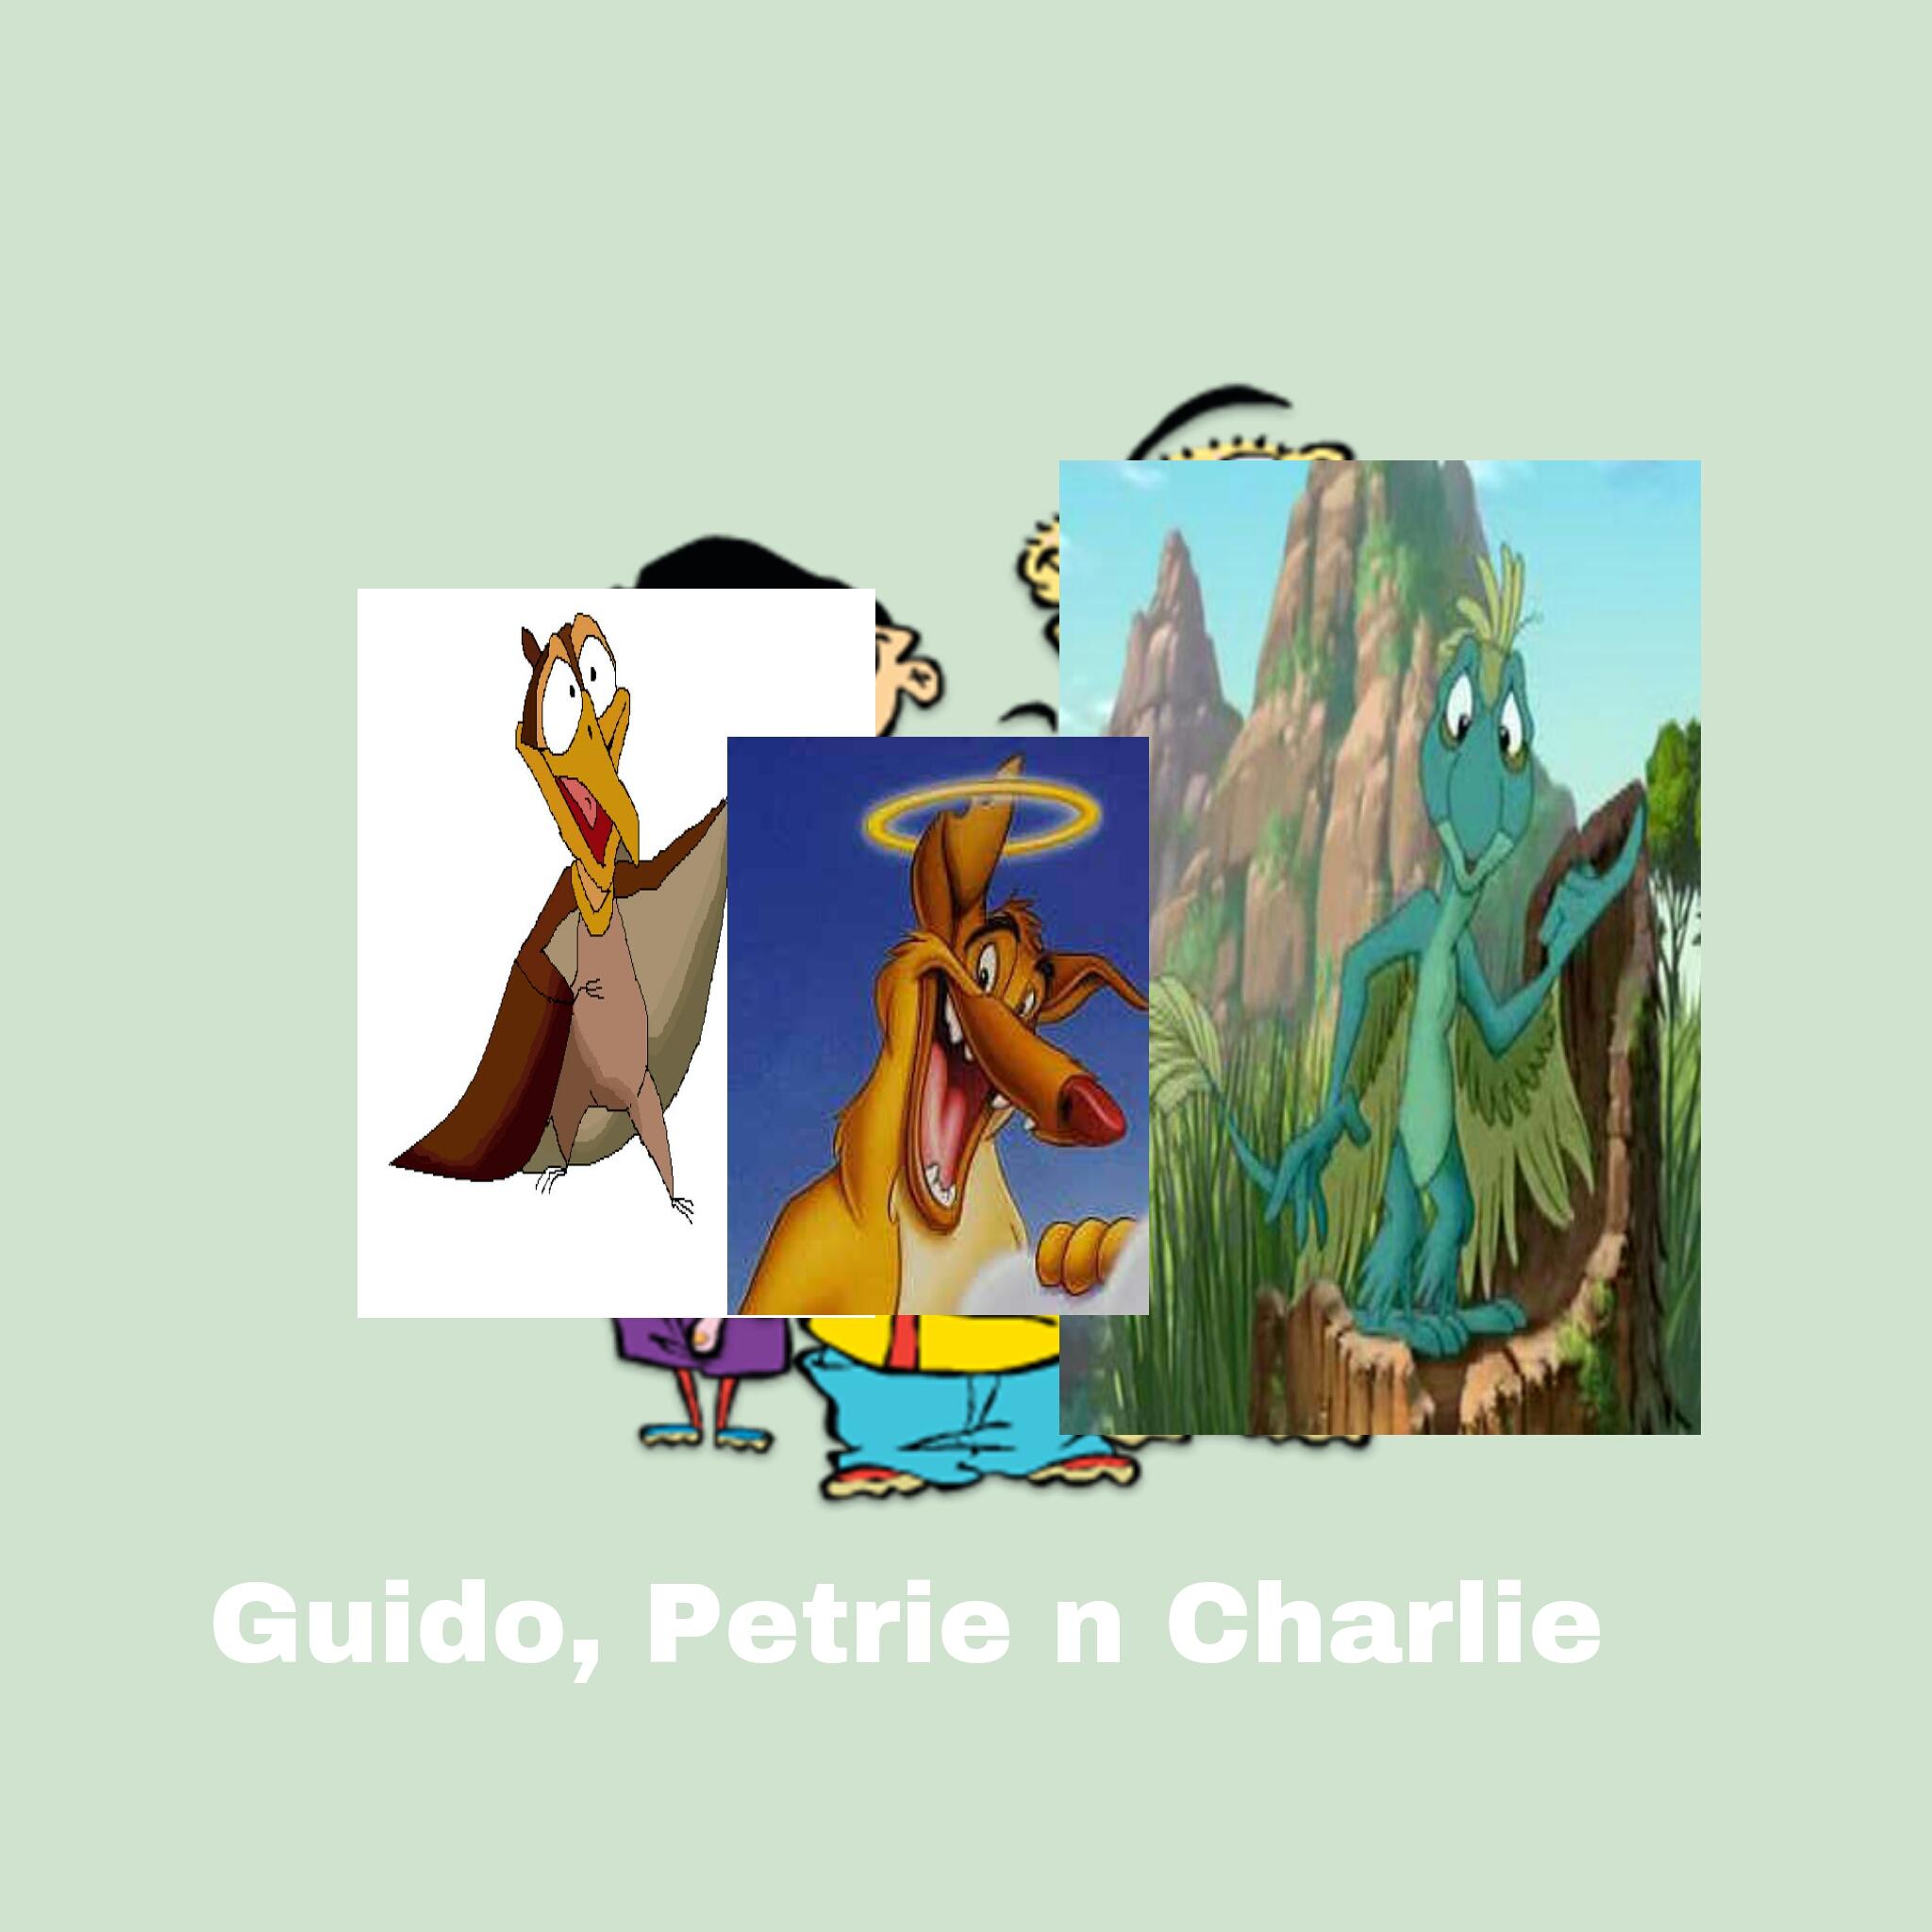 Guido, Petrie n Charlie